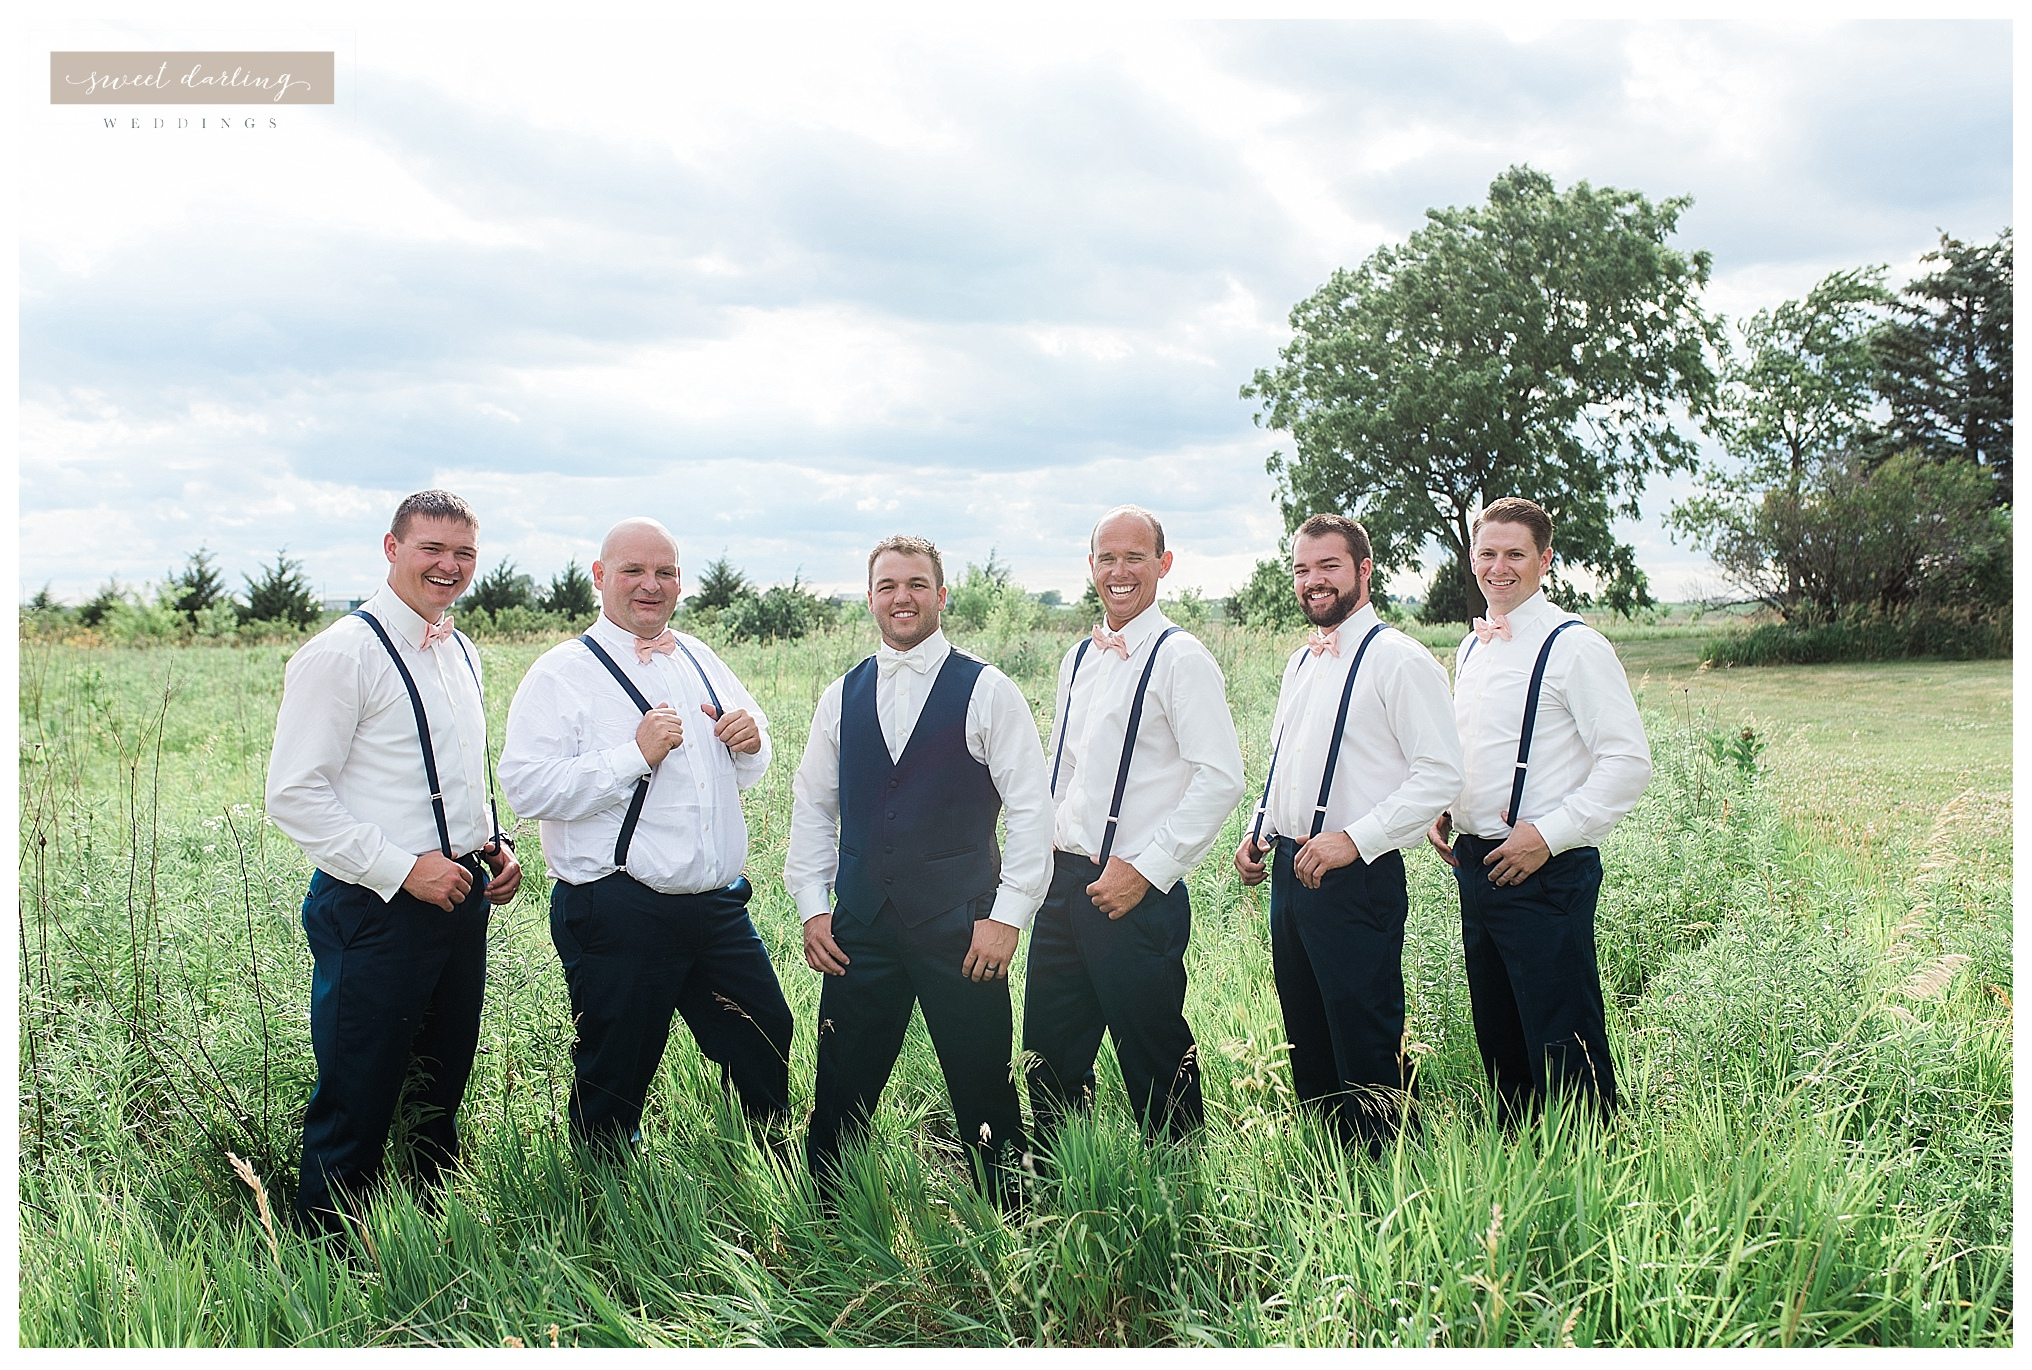 Paxton-illinois-engelbrecht-farmstead-romantic-wedding-photographer-sweet-darling-weddings_1215.jpg